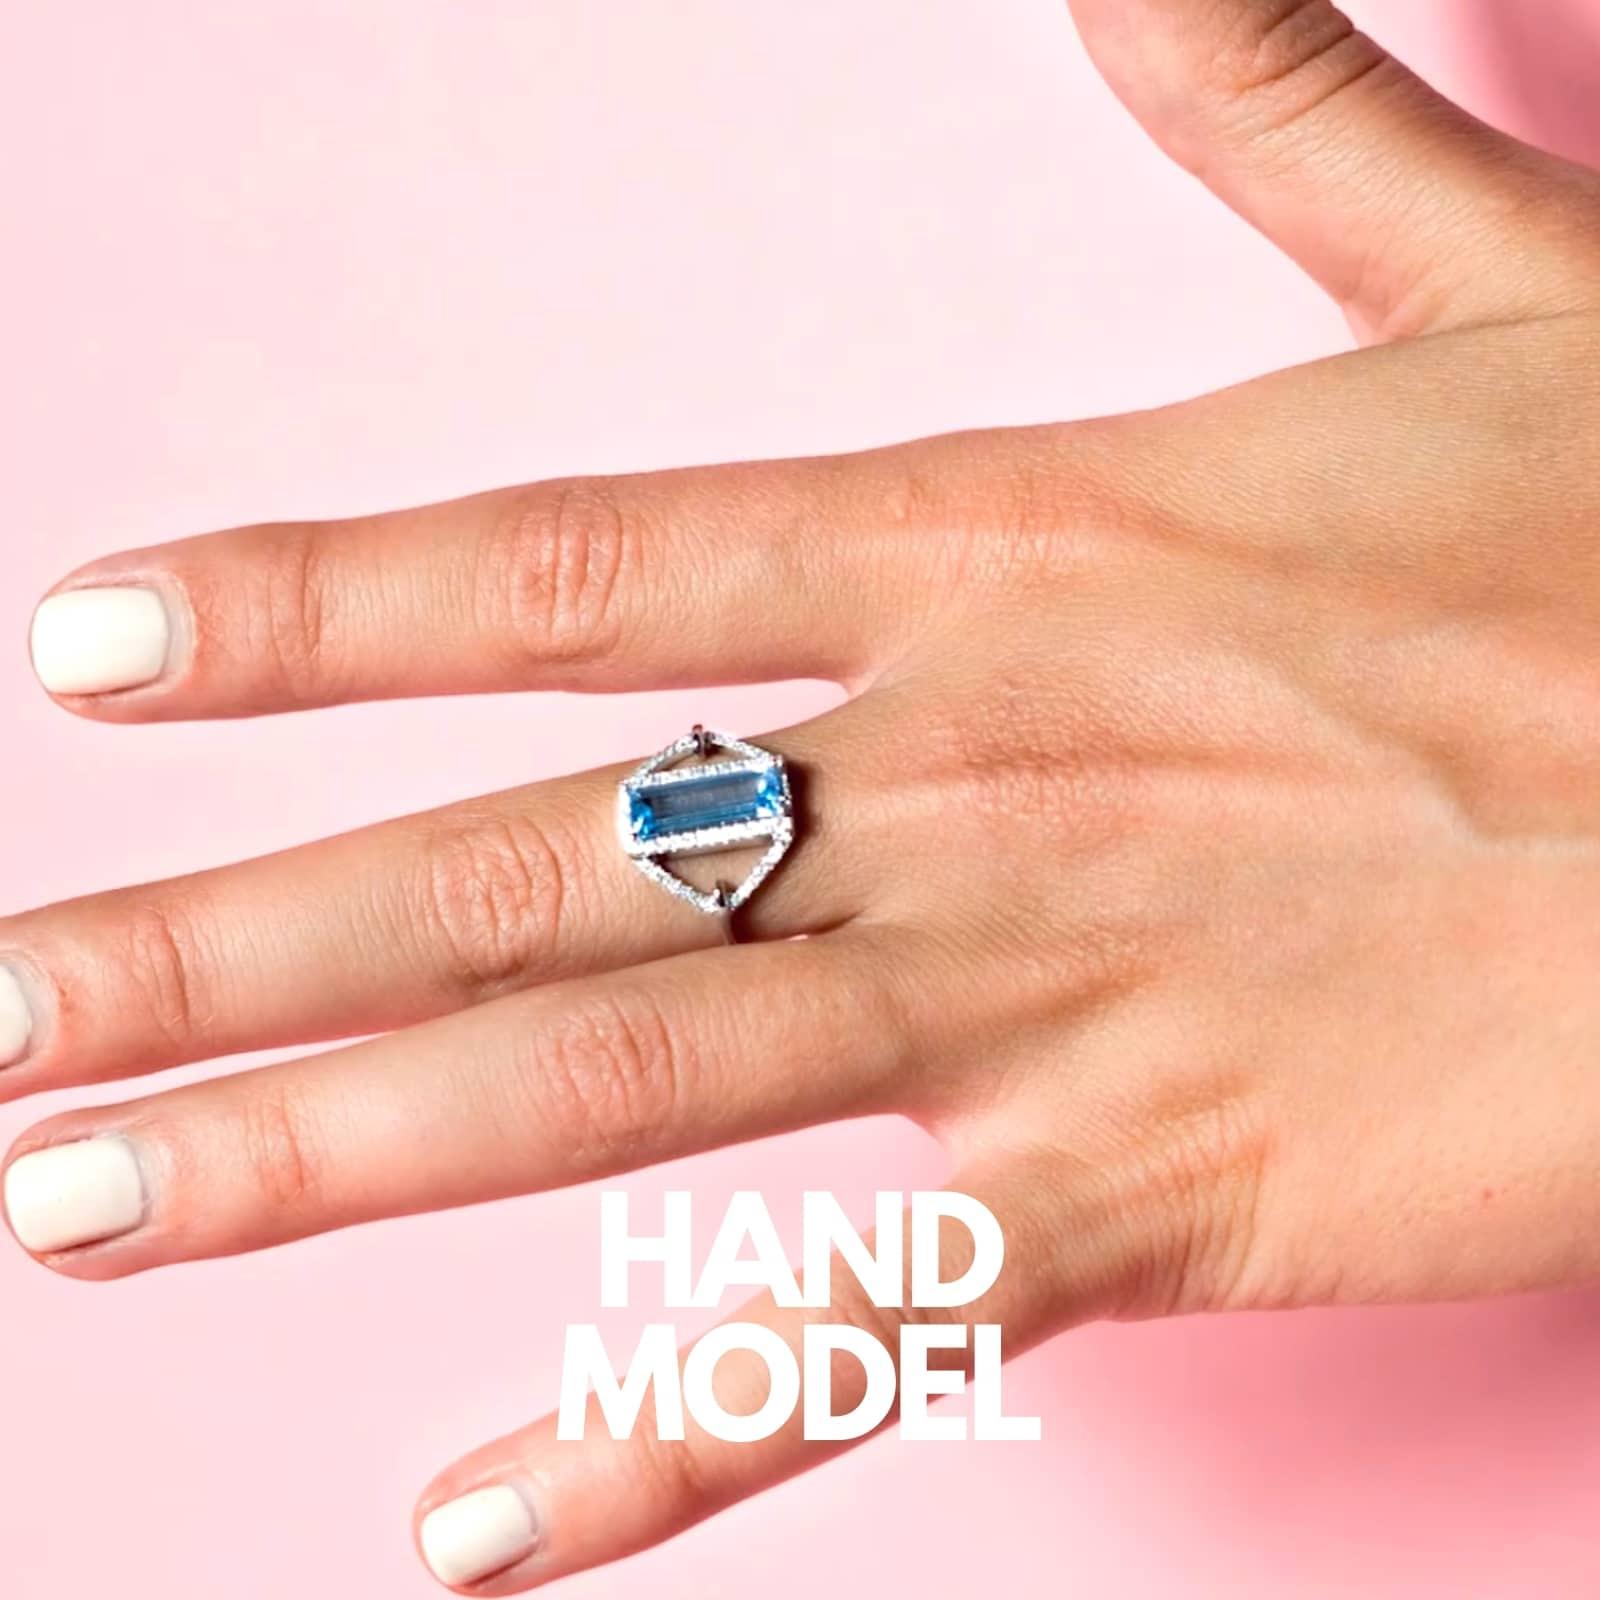 Hand Model demonstrating wearing a blue ring on her long finger